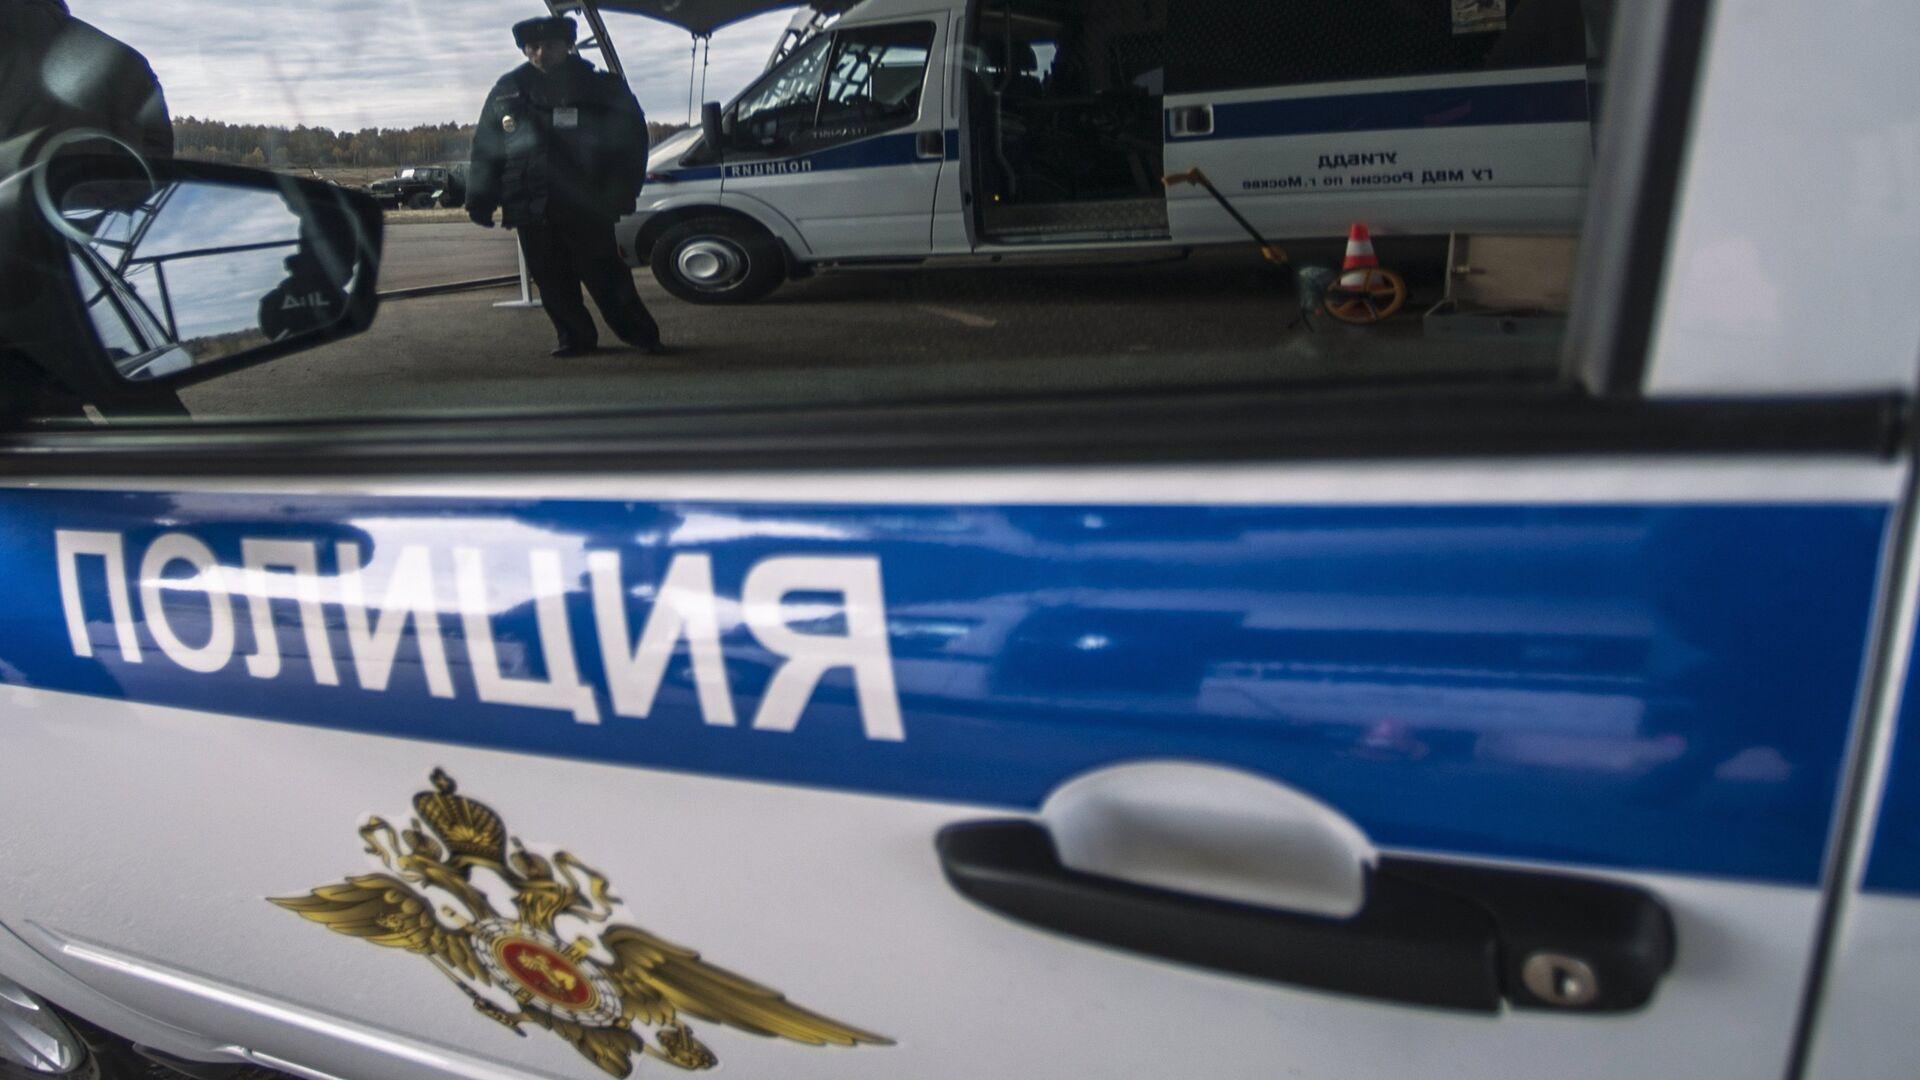 Машина полиции. Архивное фото - РИА Новости, 1920, 27.02.2021